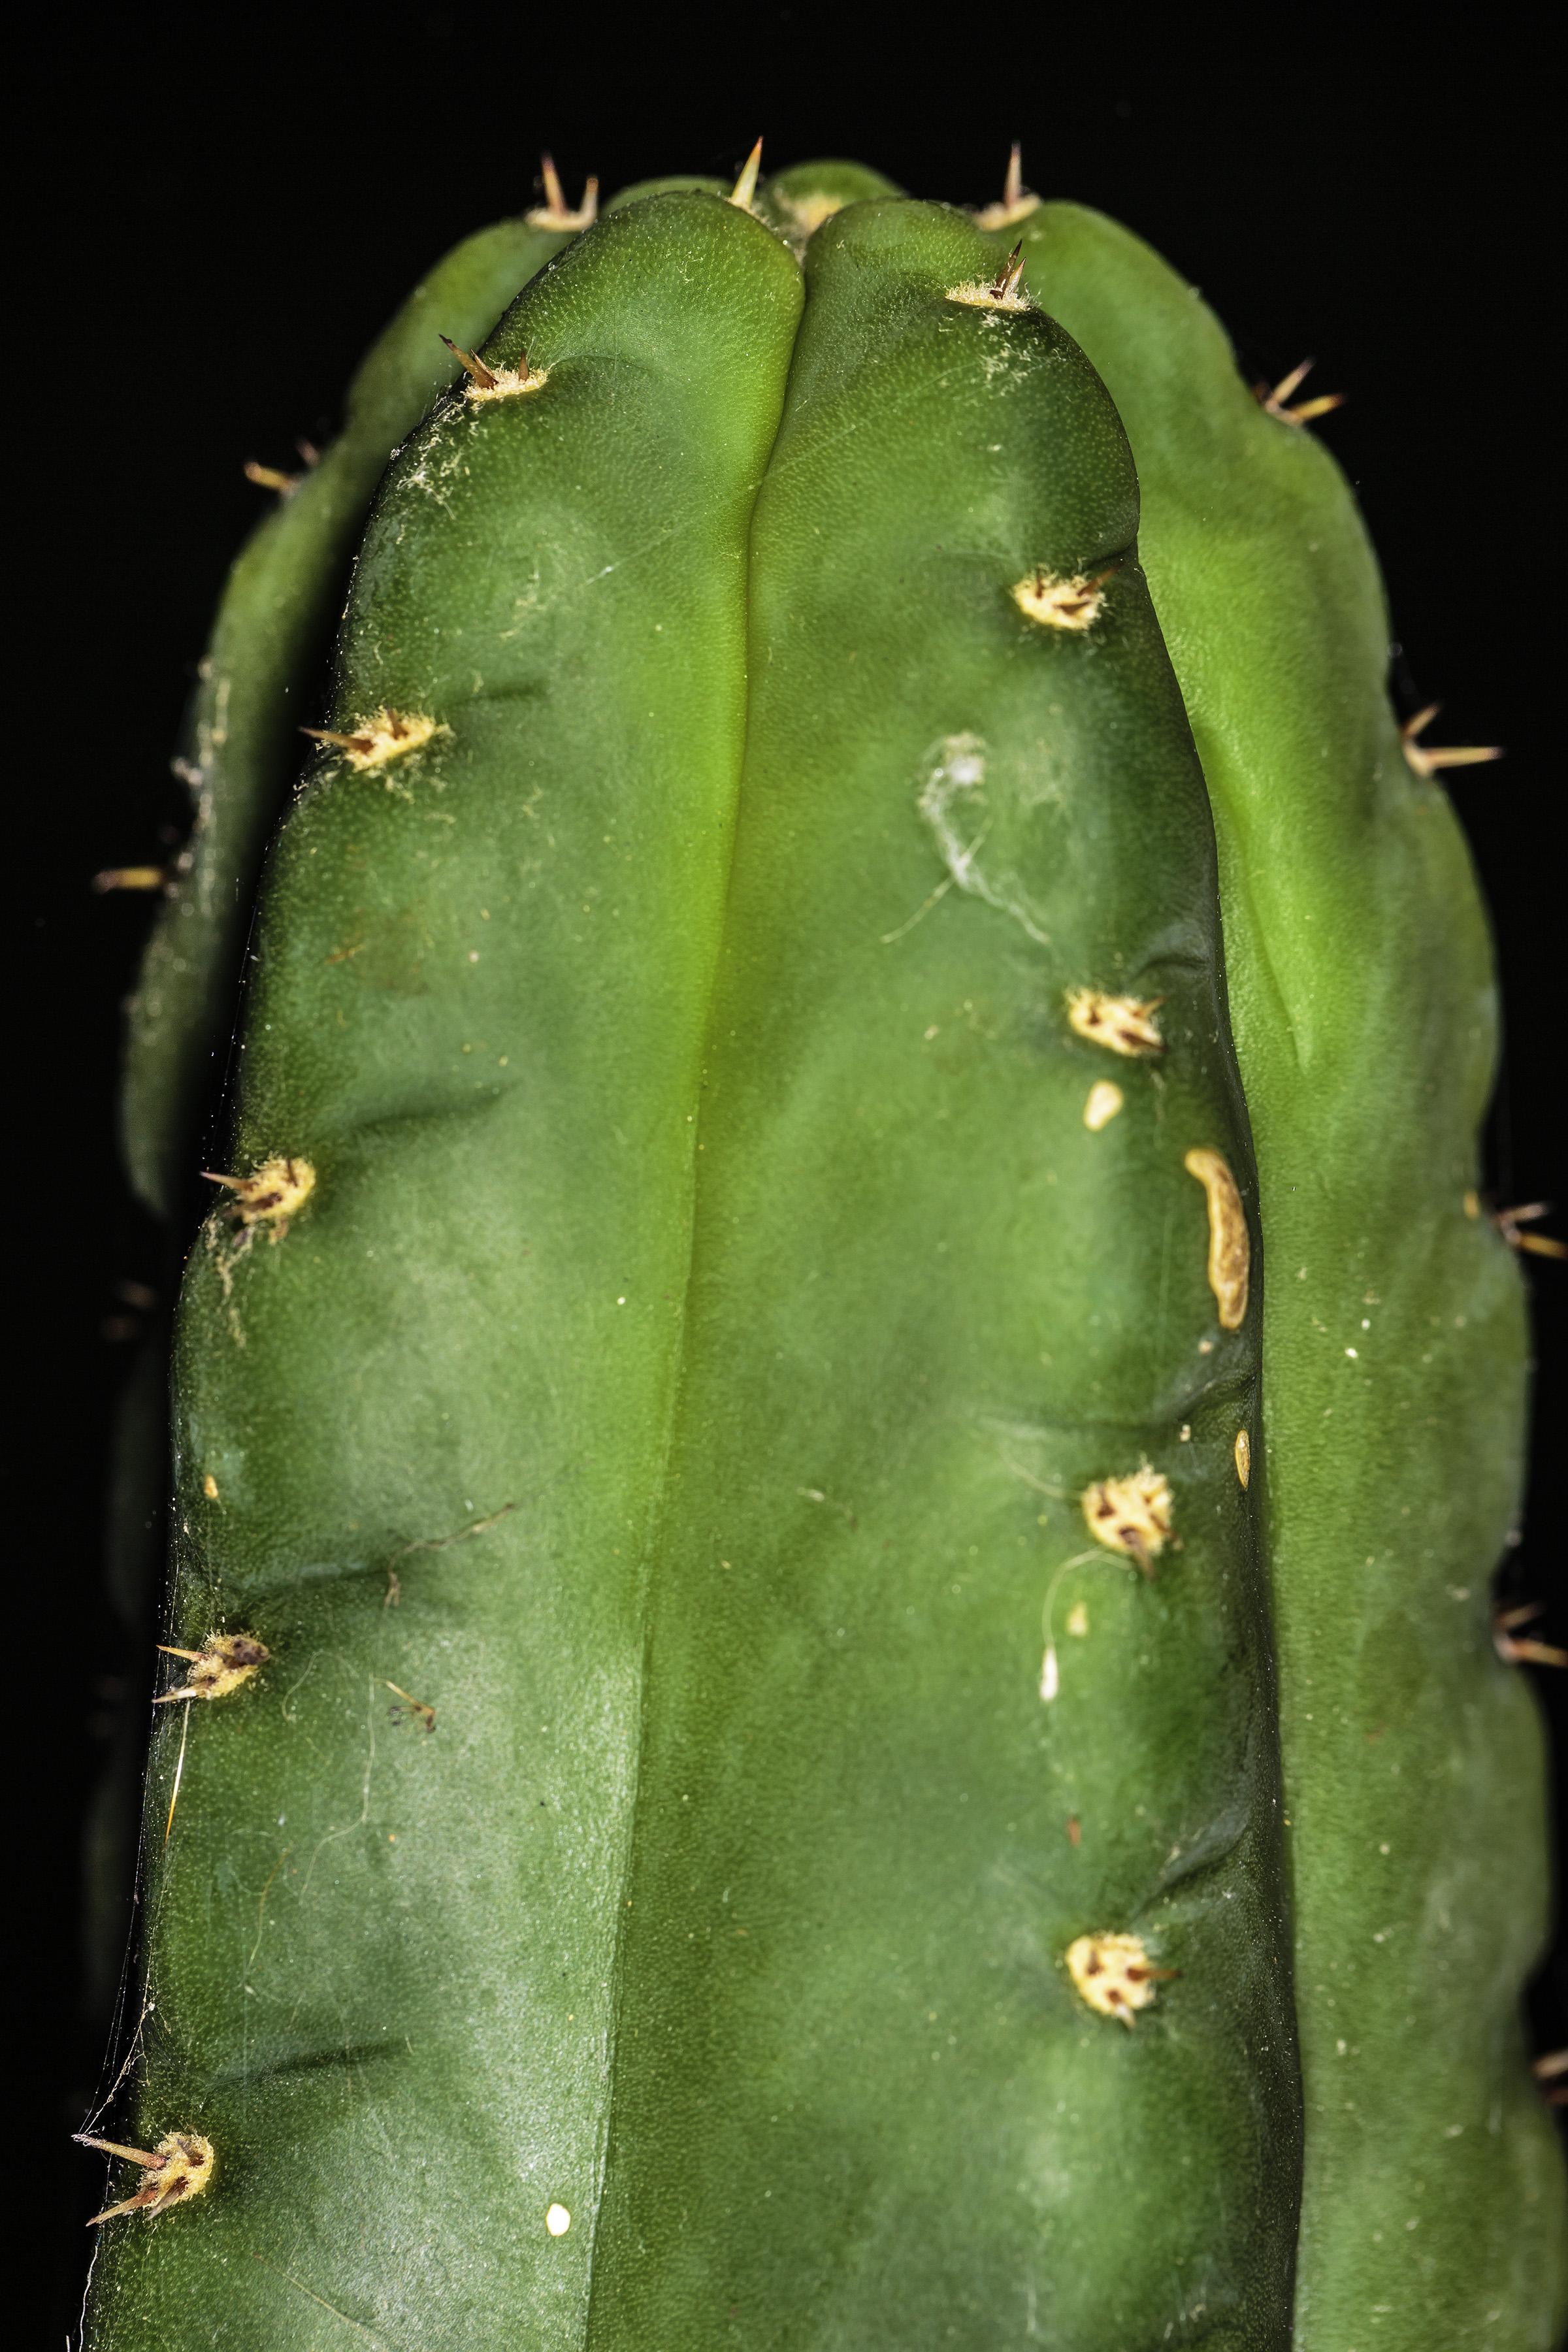 A photograph of the tip of a mature Trichocereus pachanoi (San Pedro) cactus.